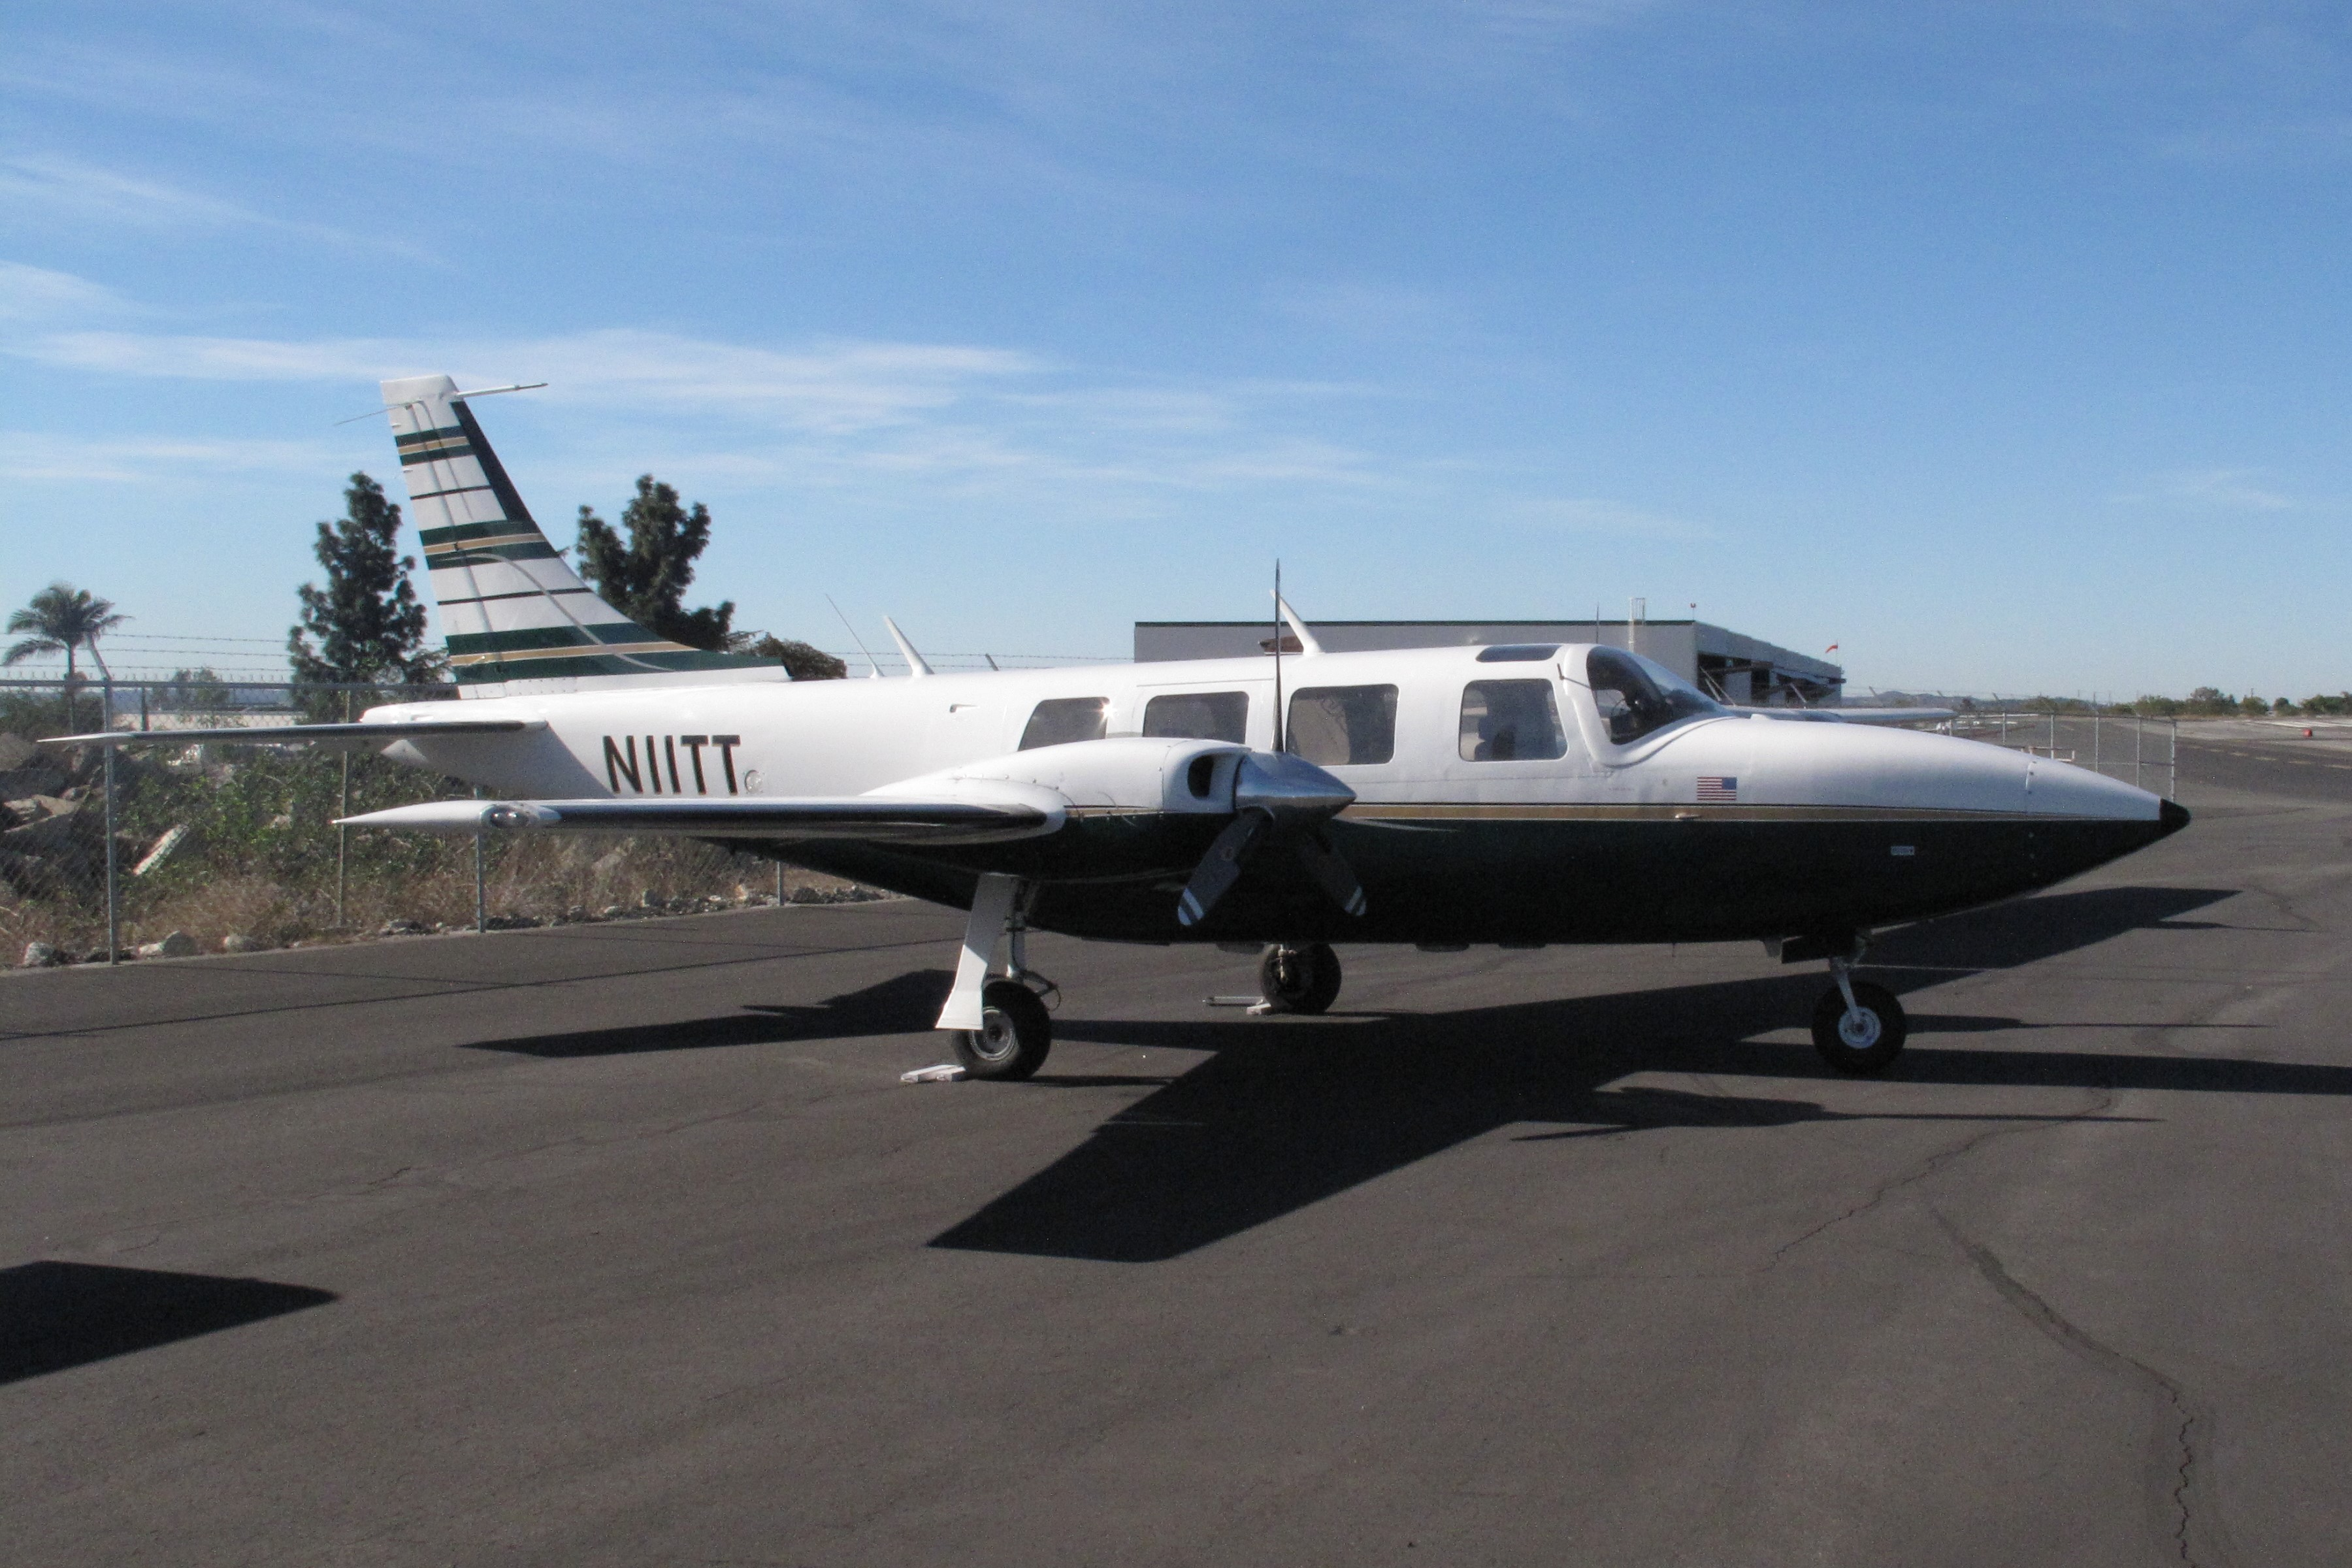 piper 600a 601b and 601p aerostar photos and specifications rh skytamer com